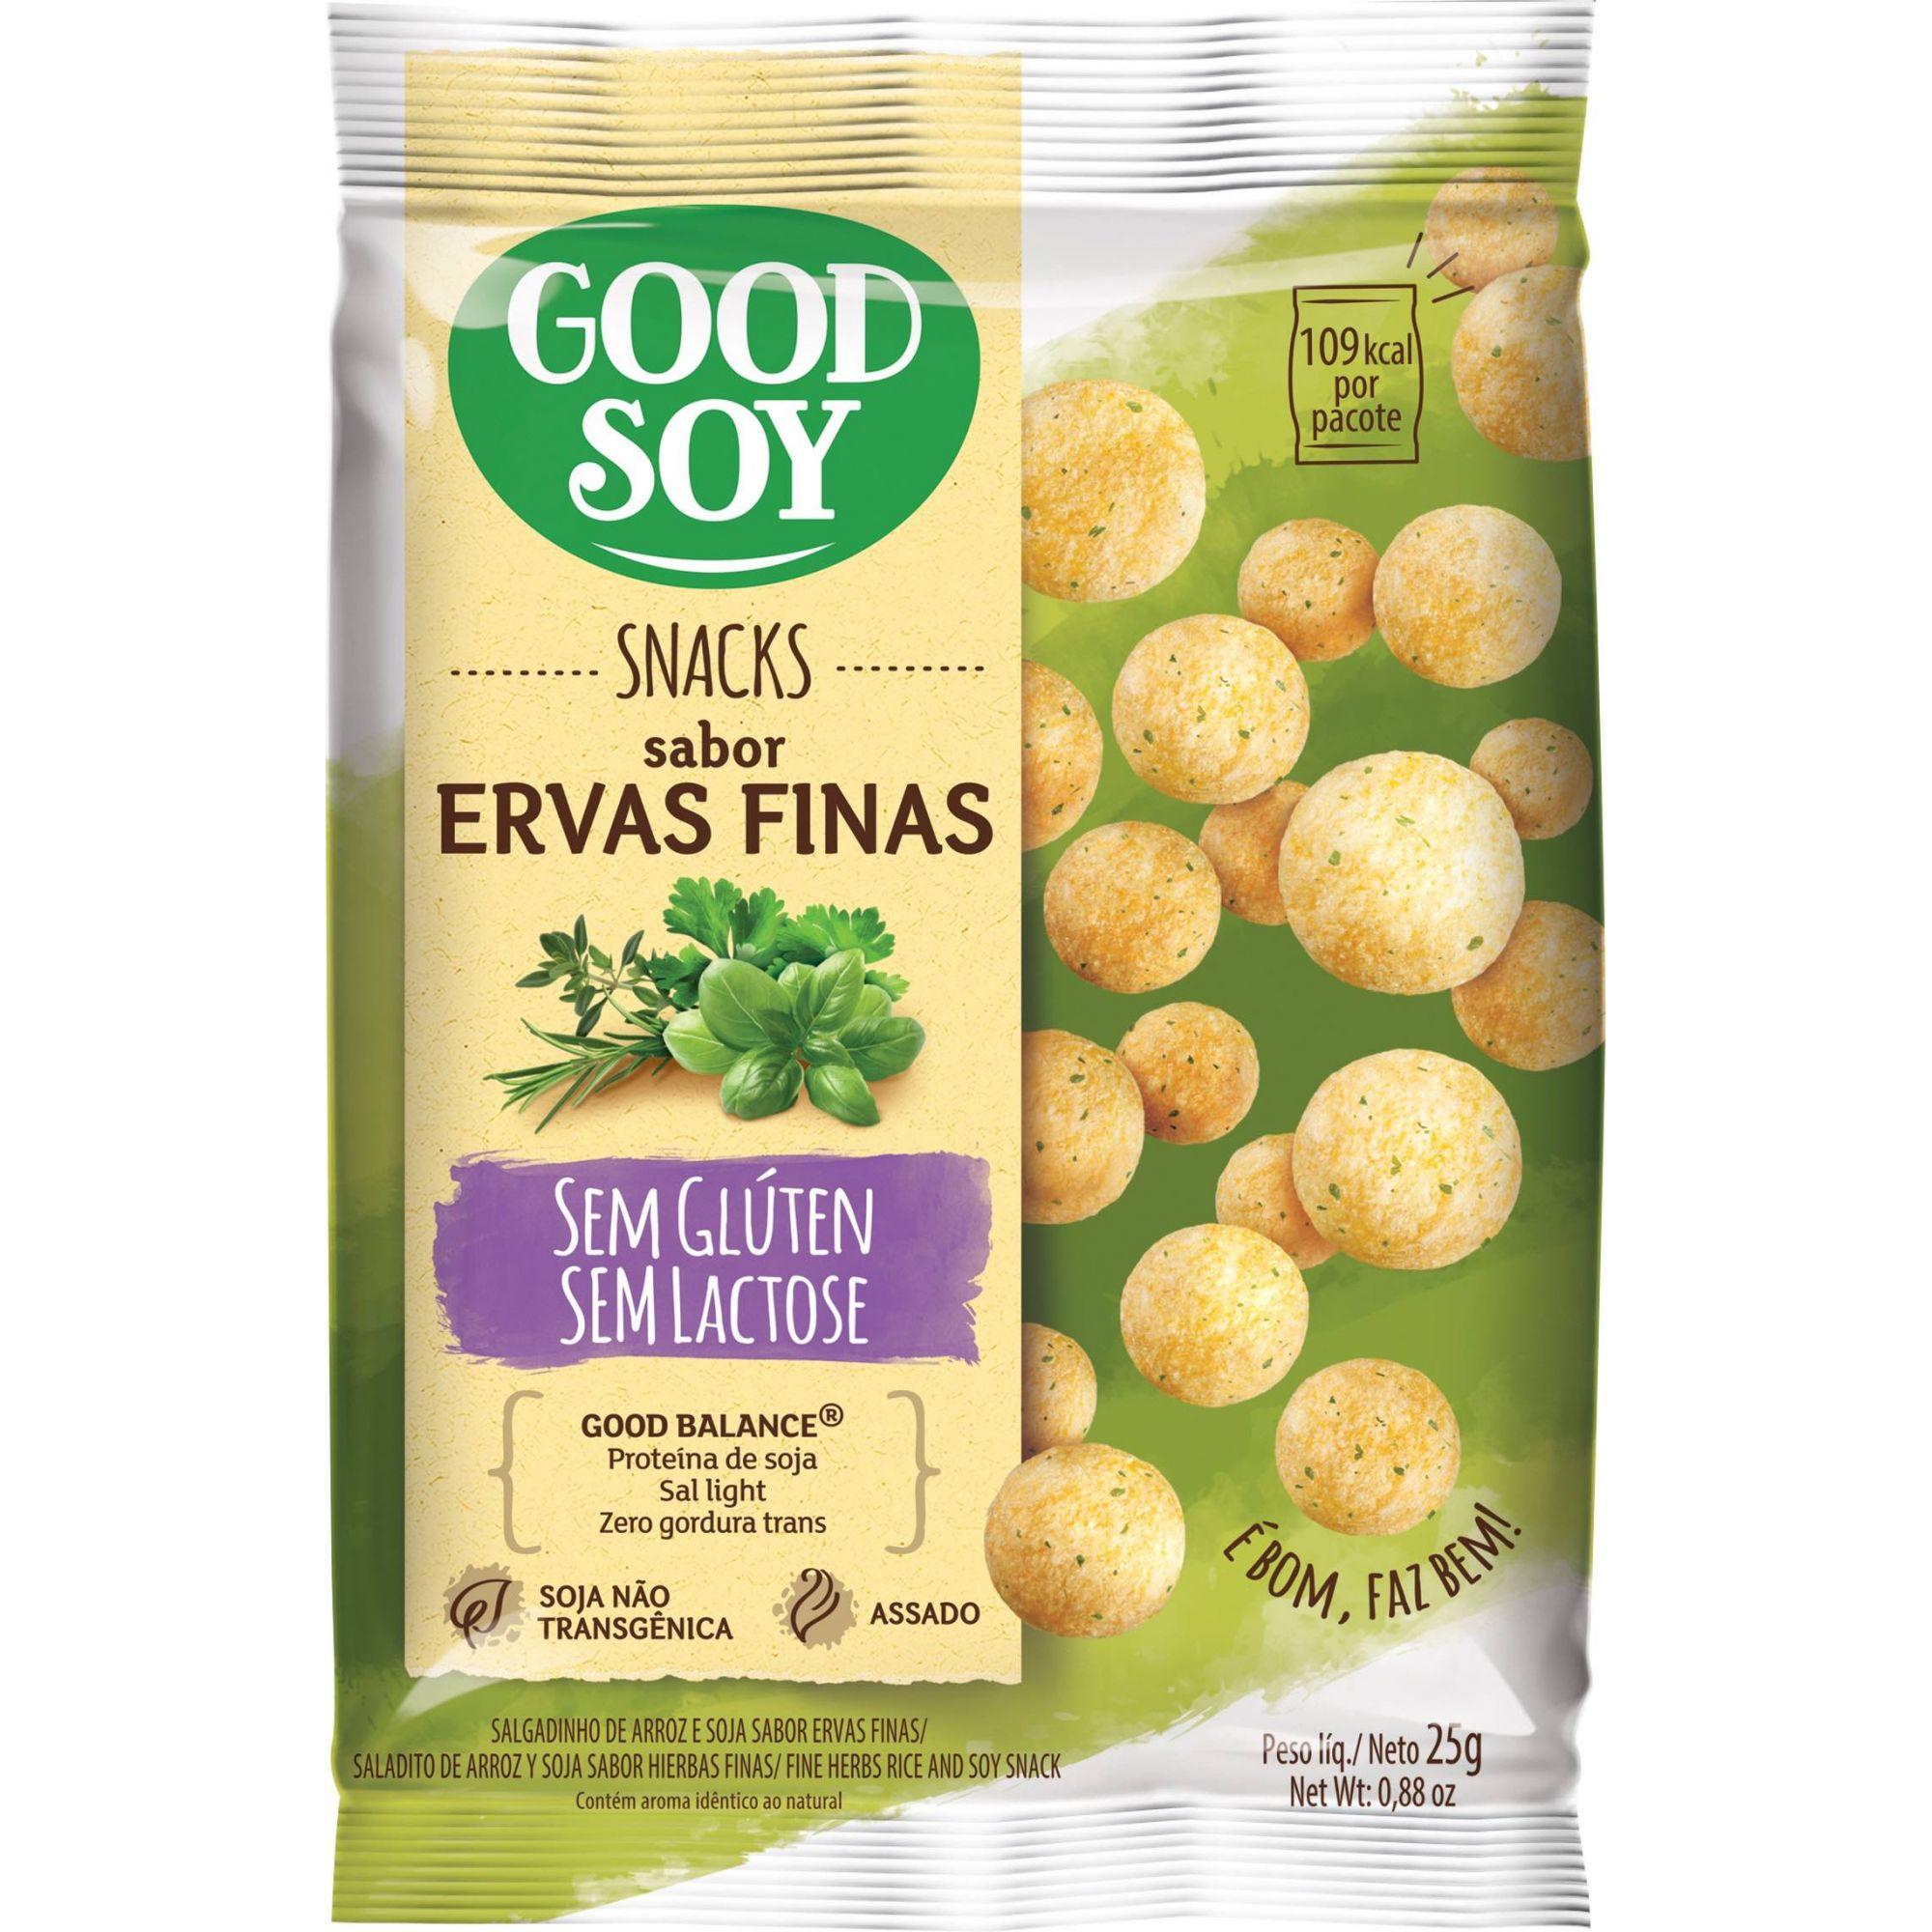 Snack salgadinho de Soja sabor Ervas Finas 25g - GoodSoy